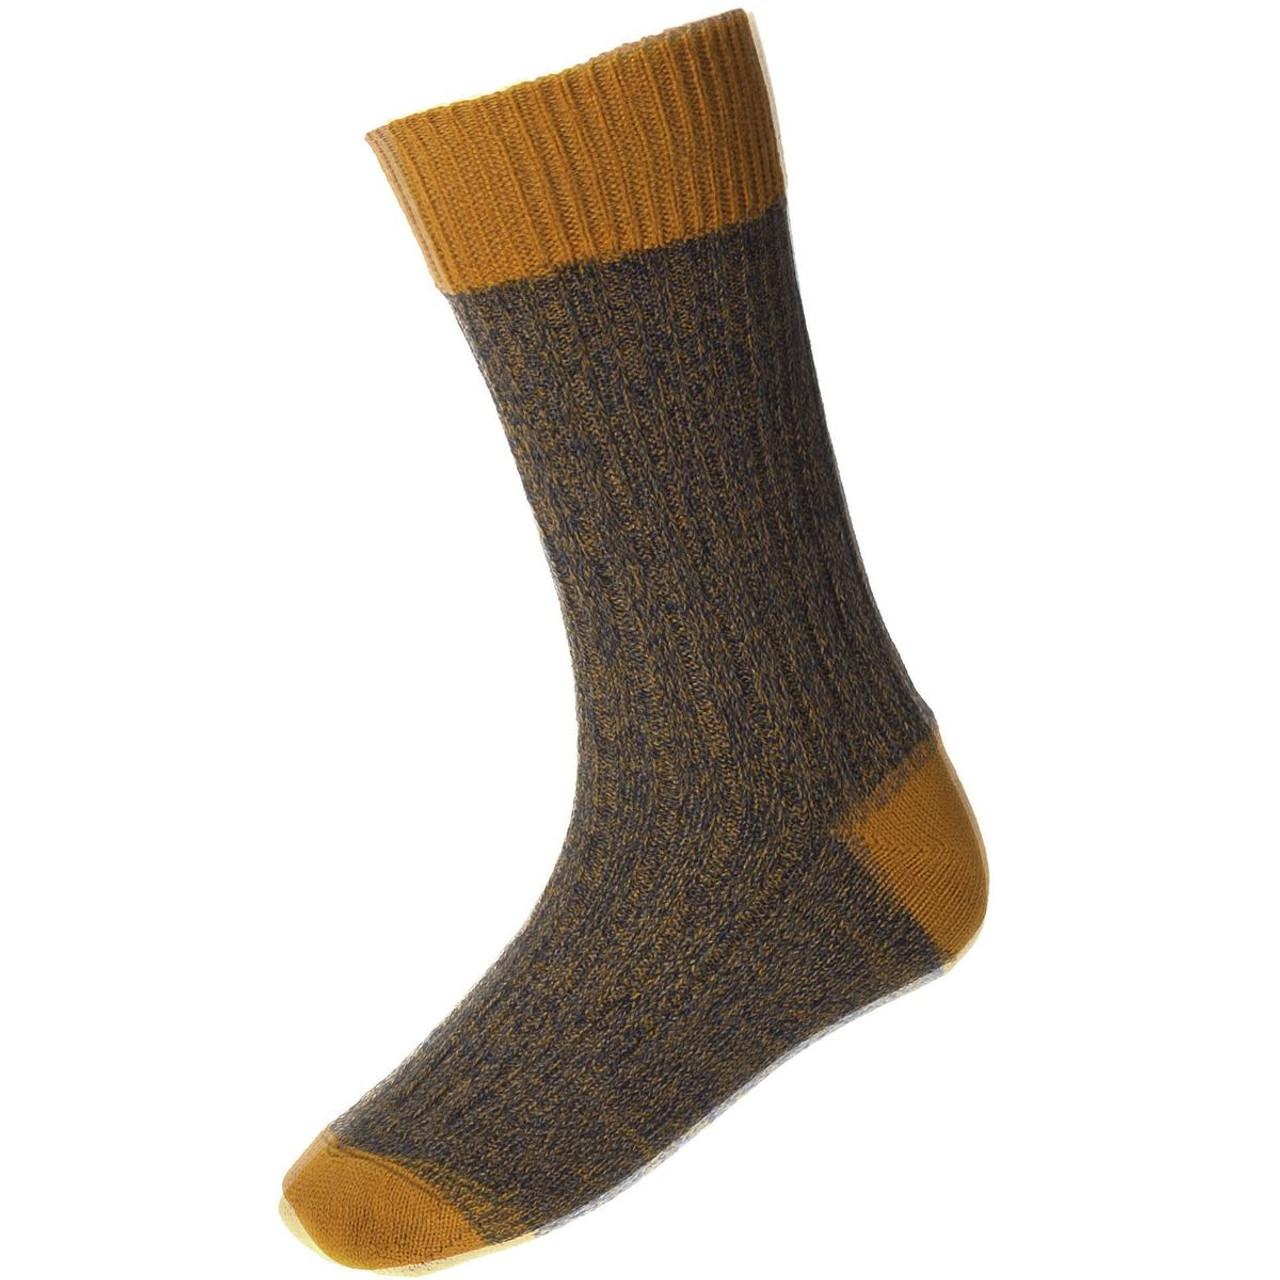 Ochre - House Of Cheviot Firth Boot Socks